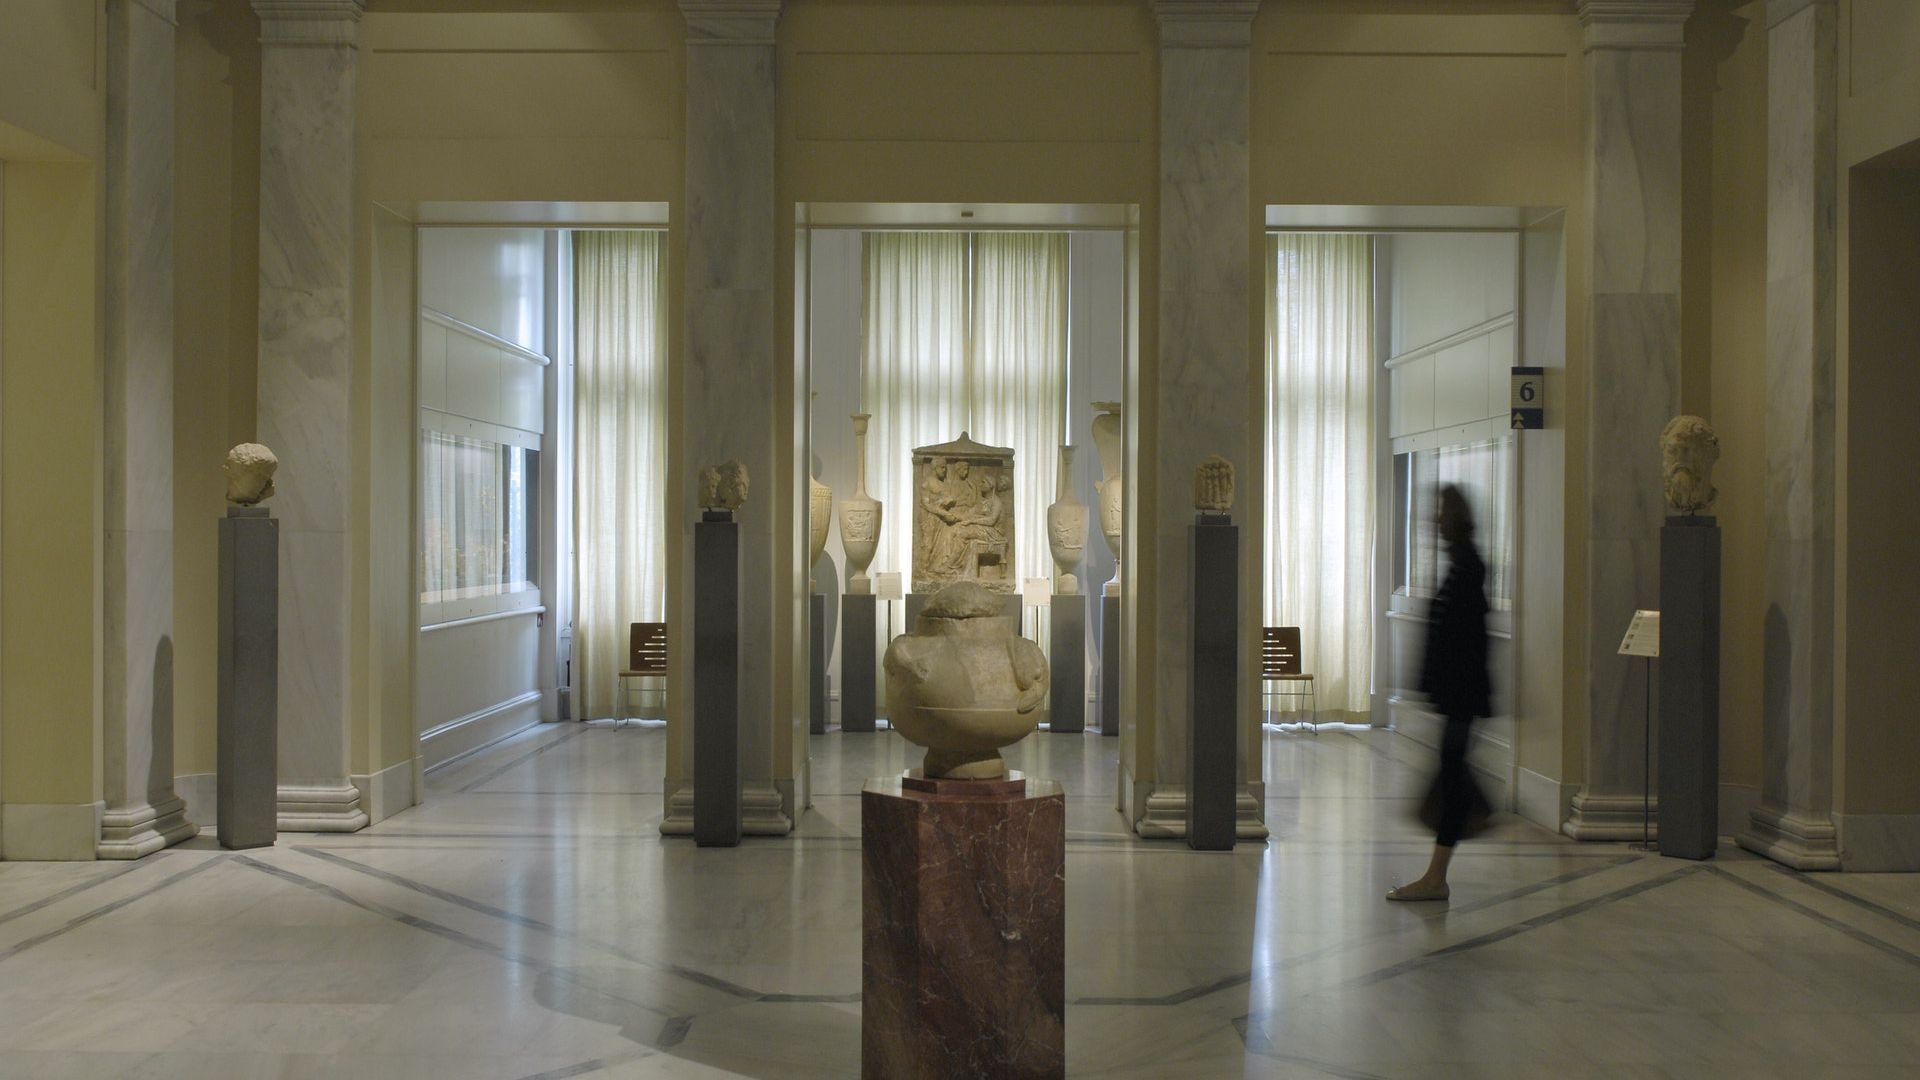 Benaki Museum of Modern Greek Culture